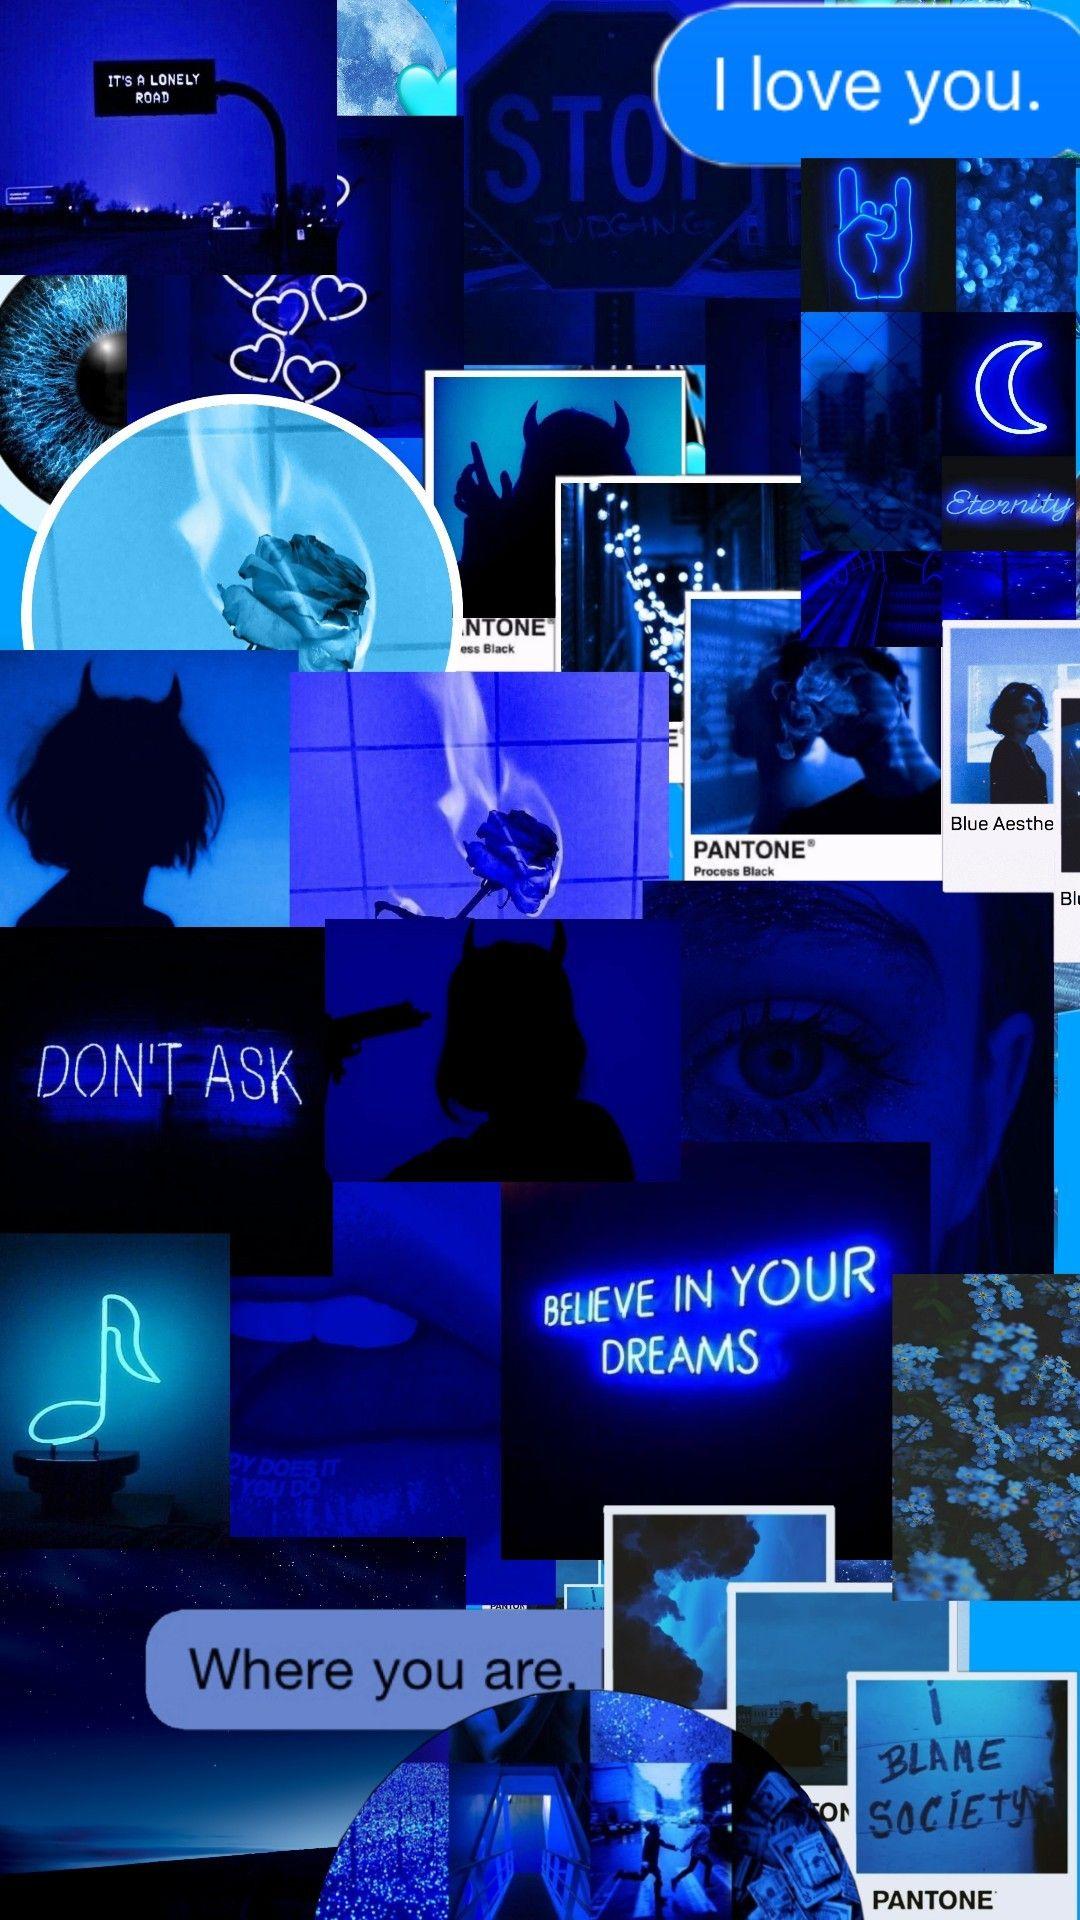 Led Neon Wallpaper Electric Blue Neon Blue Aesthetic J Yings3cr3tworld